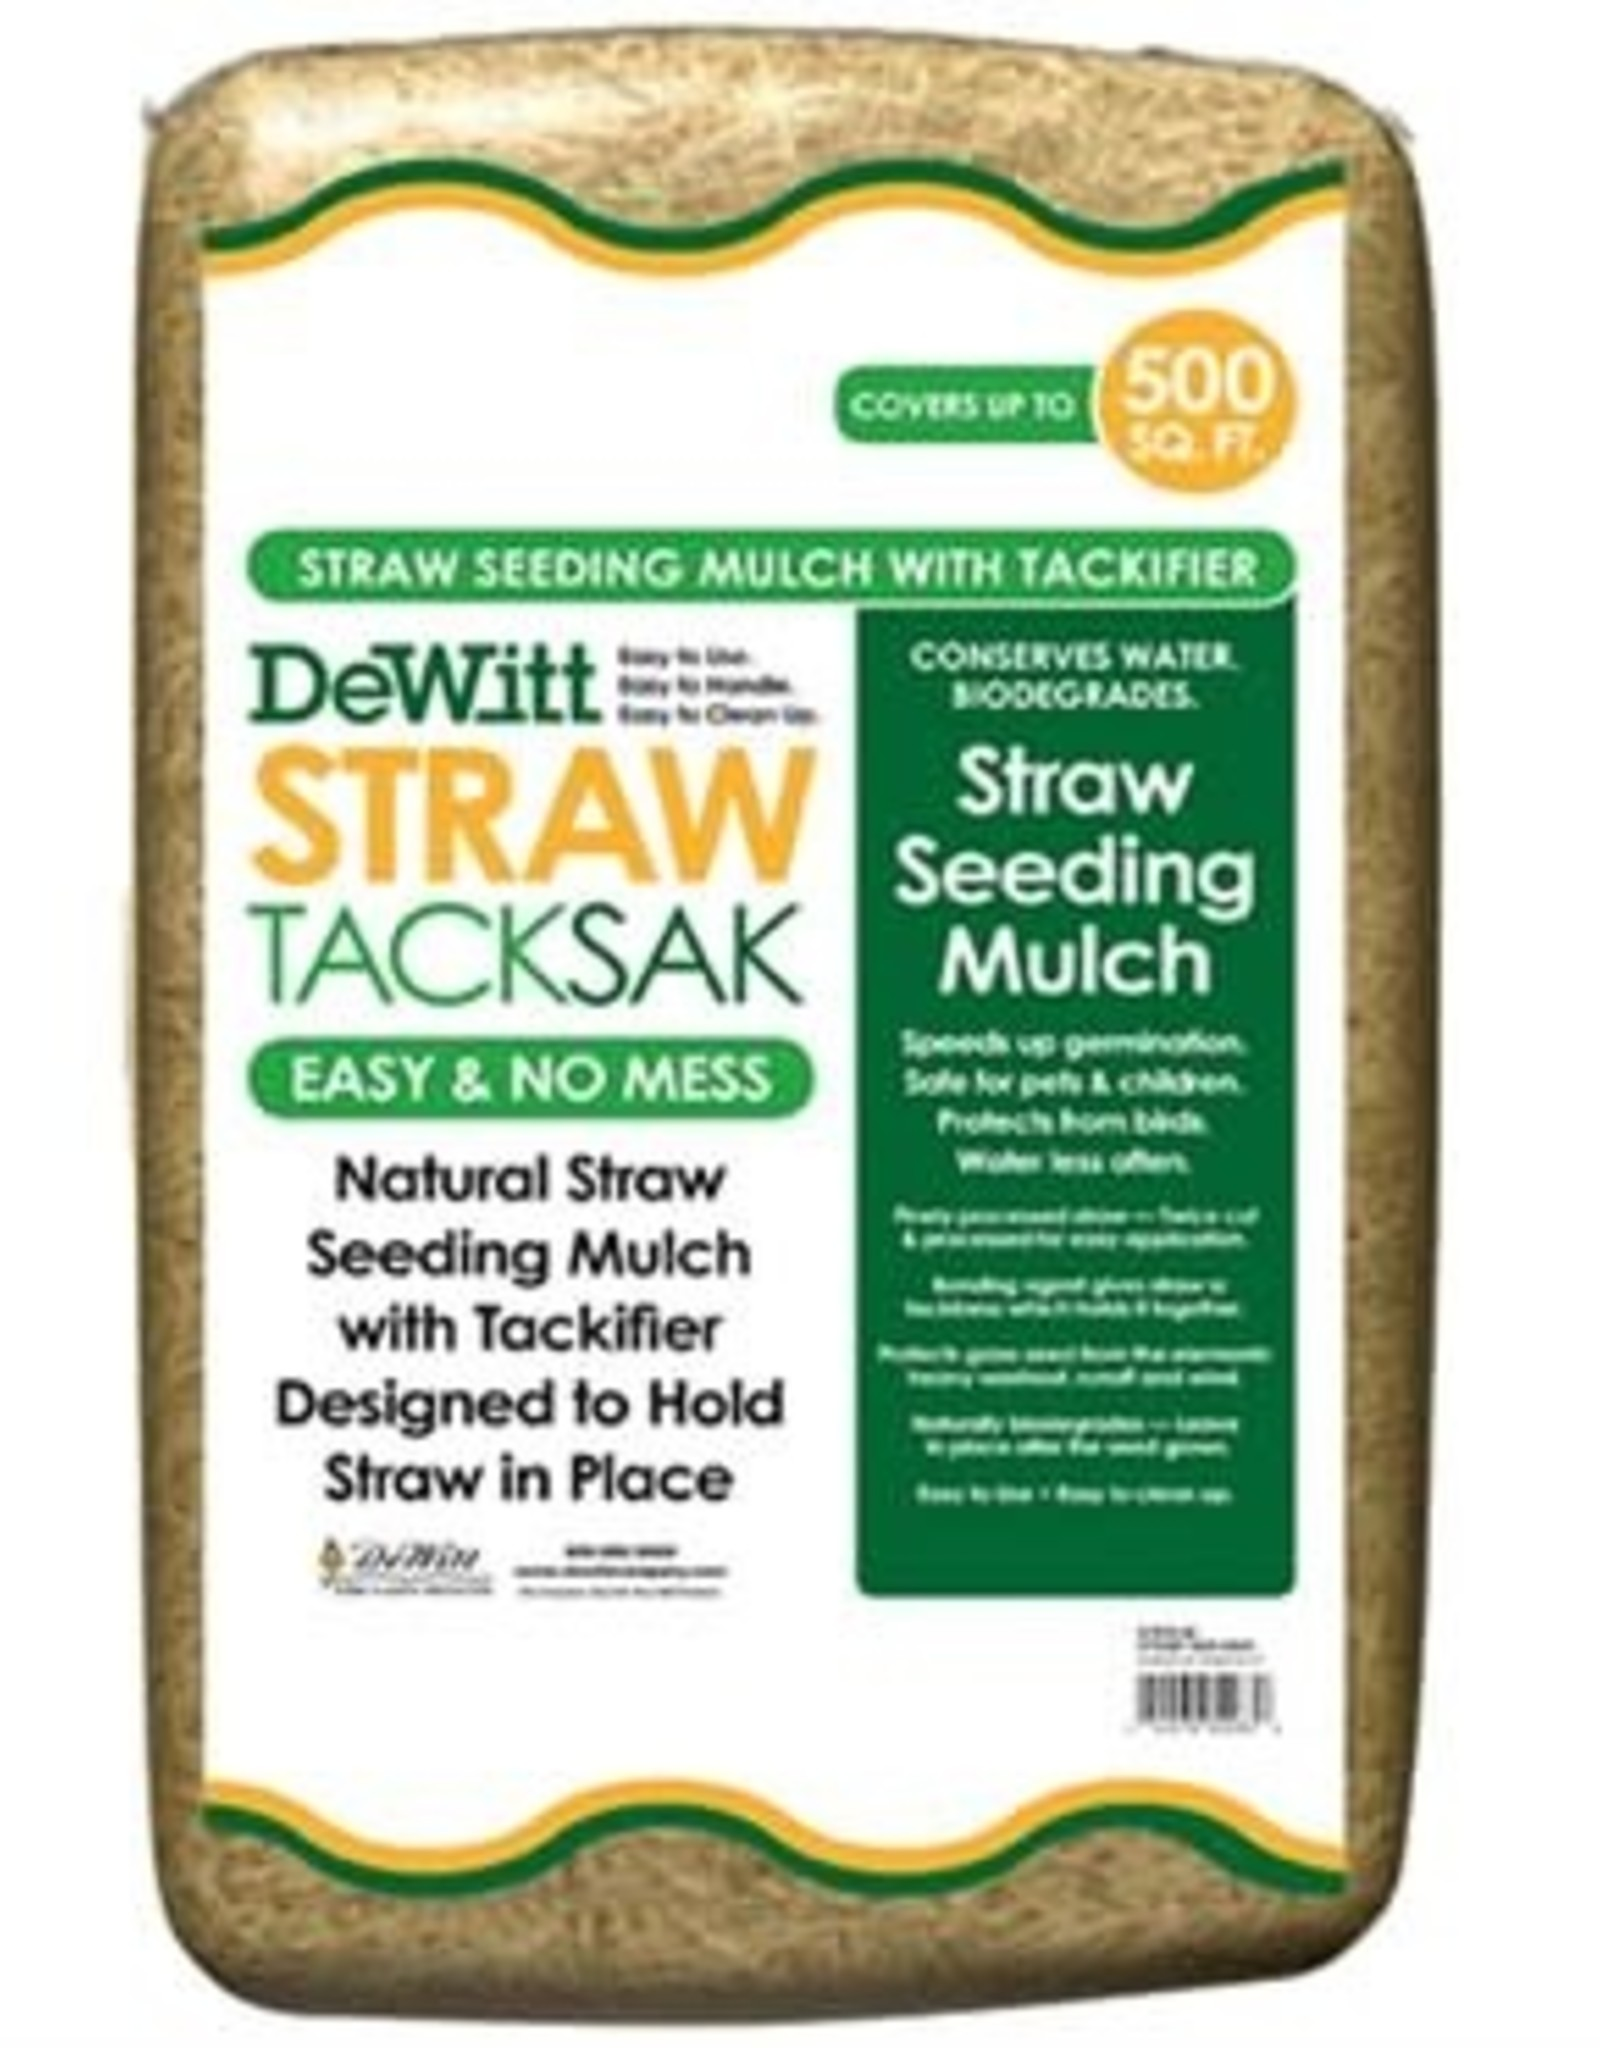 DeWitt Straw TackSak